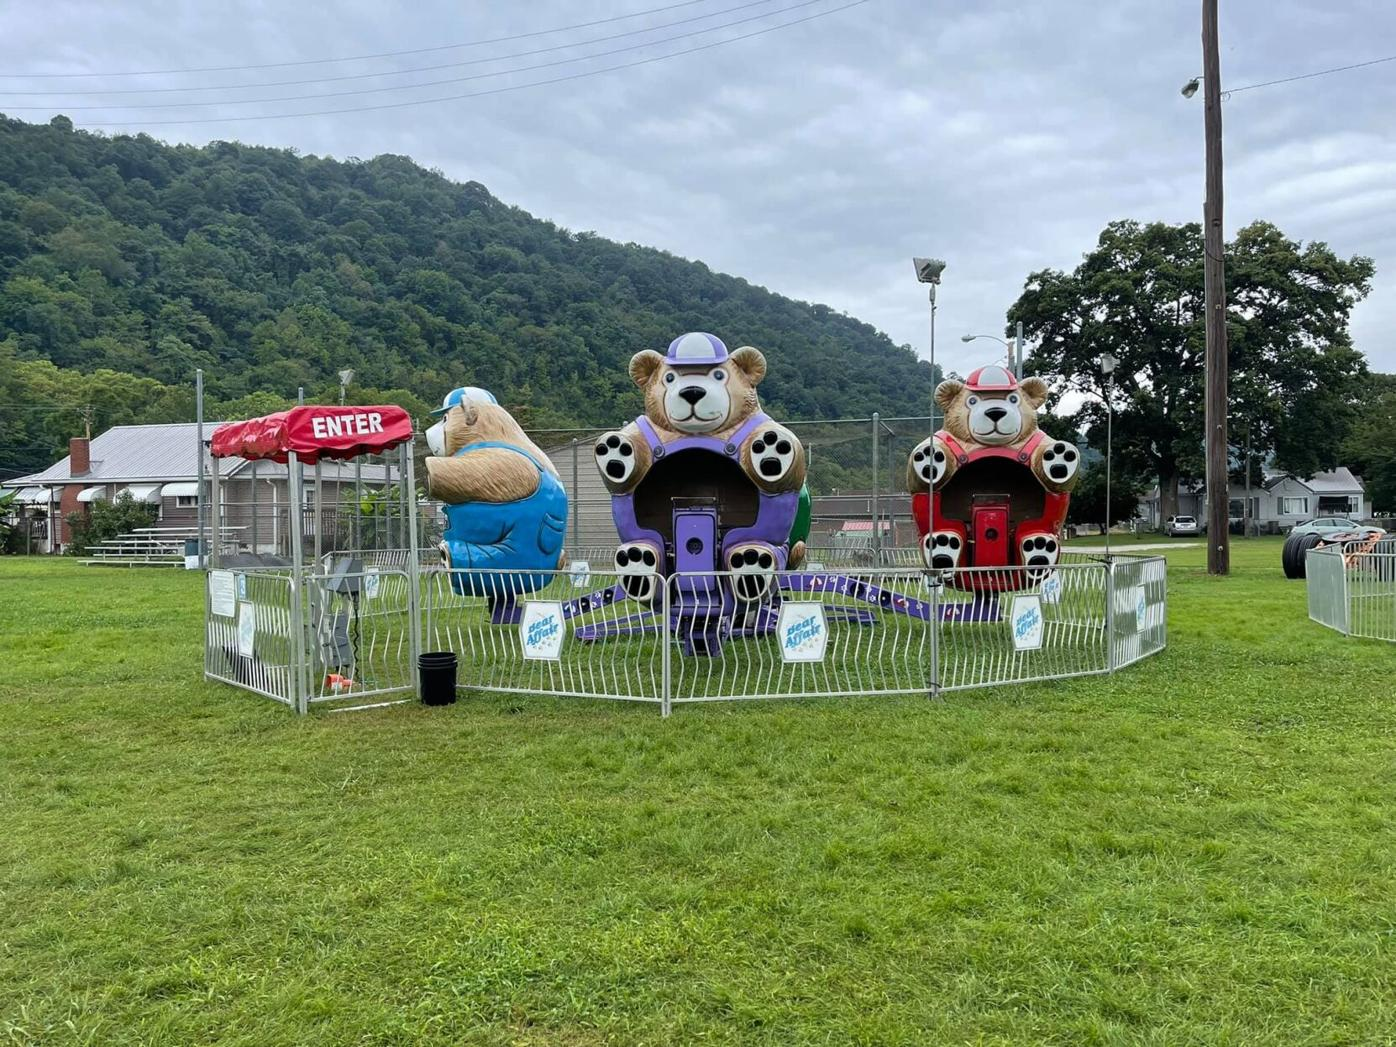 Lewis County Fair to begin September 22